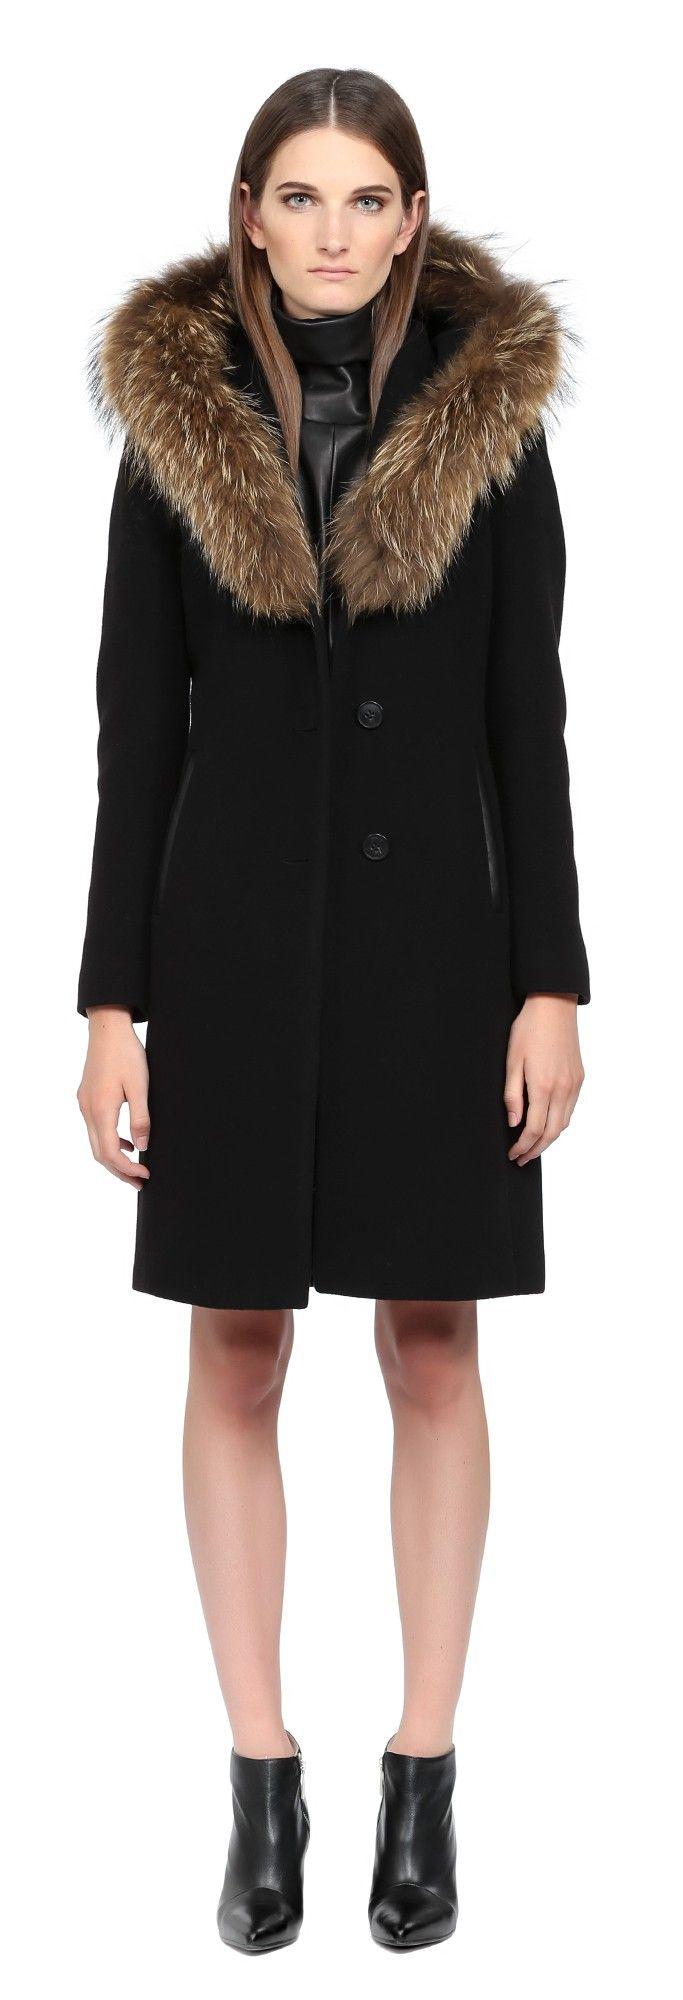 Long Black Wool Coat With Hood | Down Coat